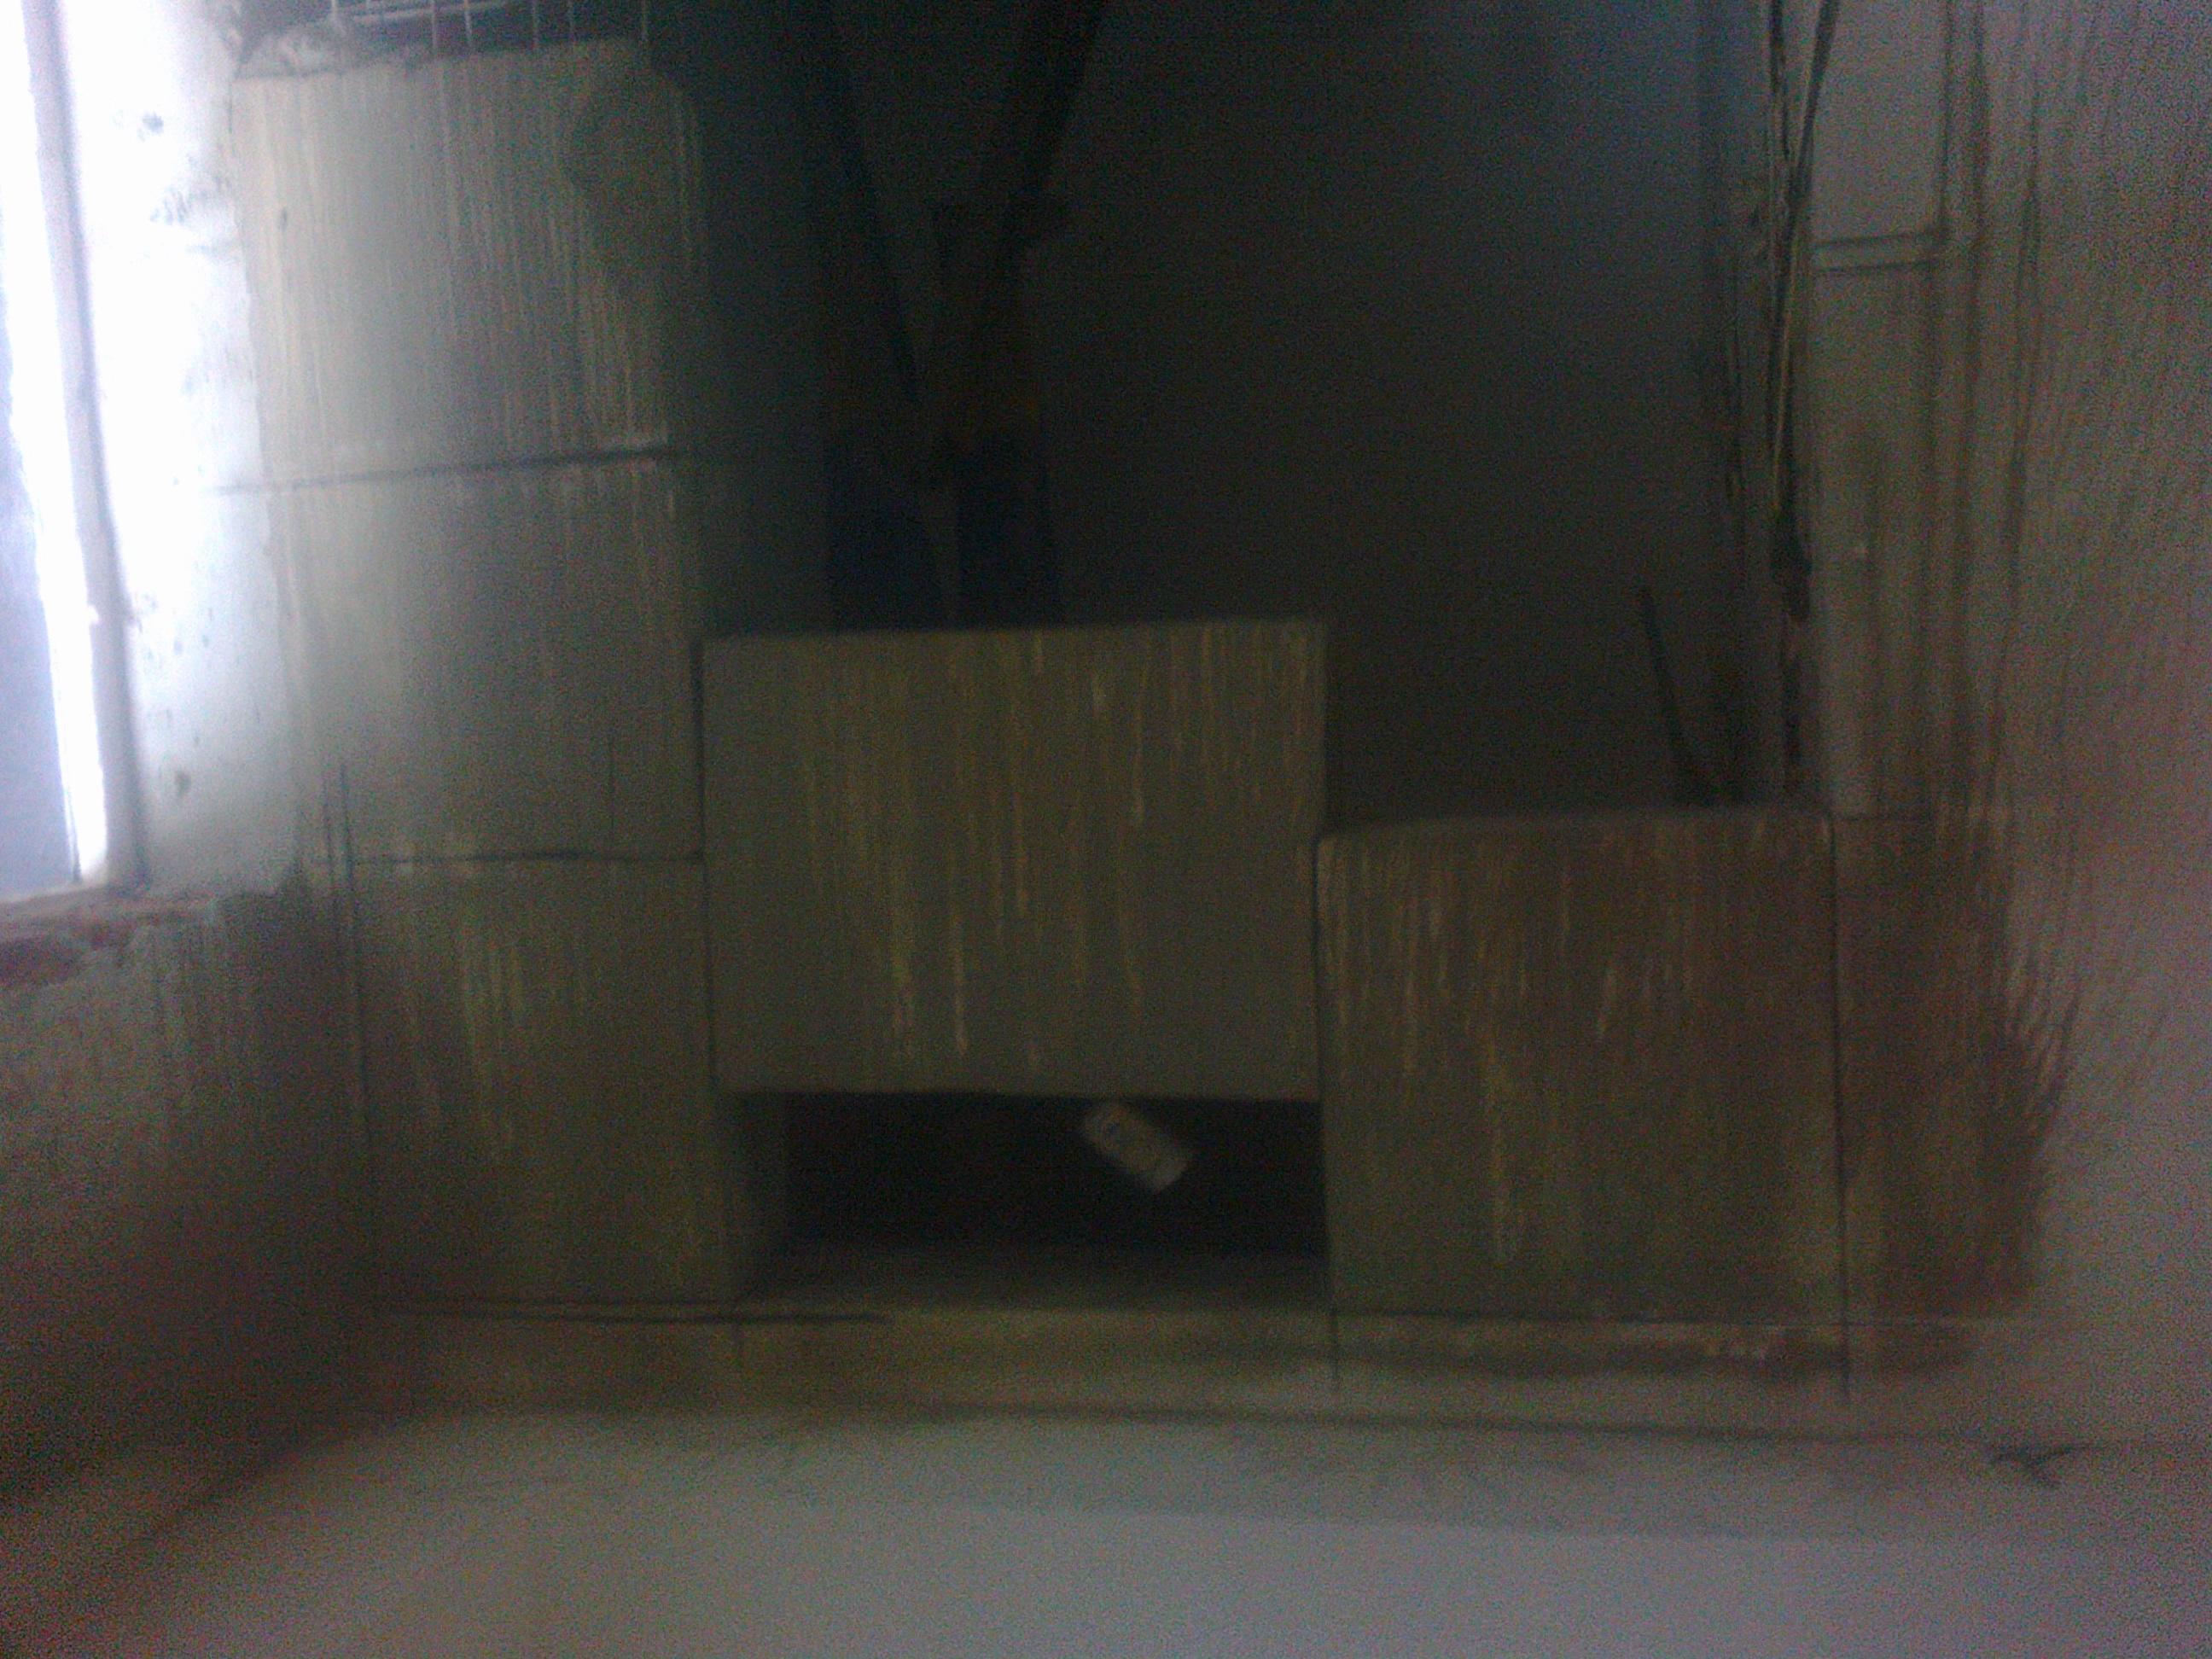 Sečenje betona PNK Beton